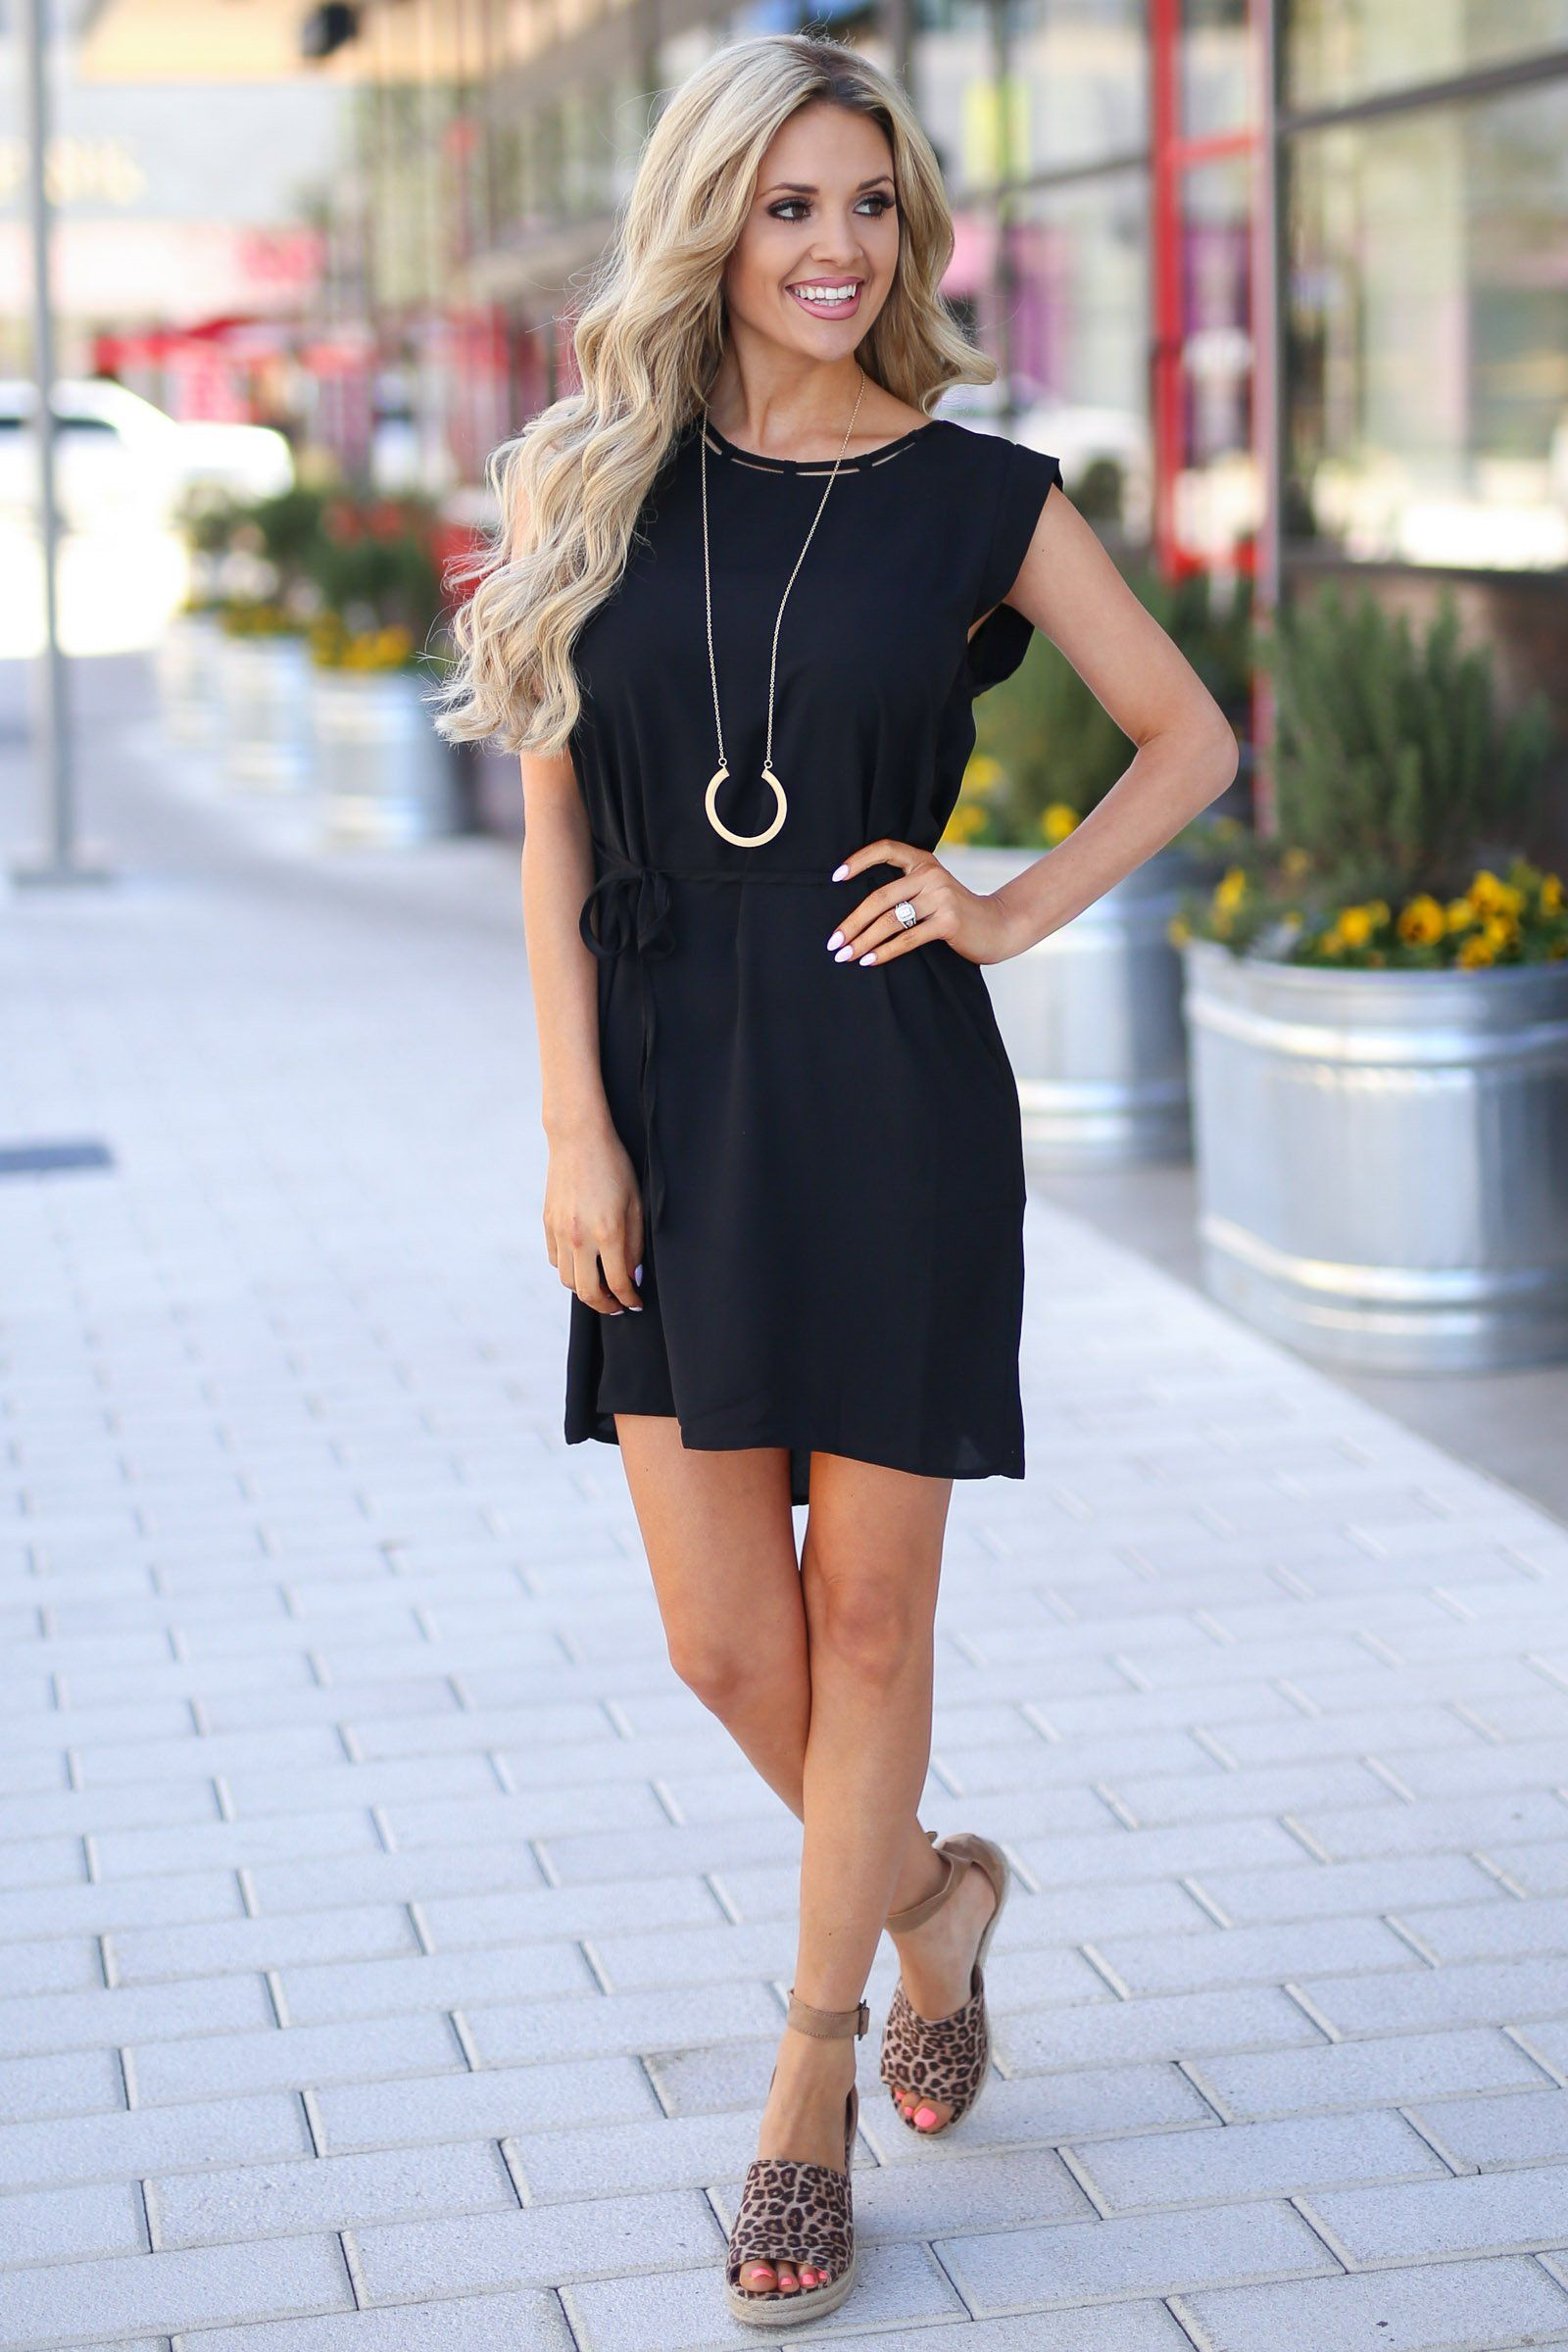 Sweet Thing Dress Black Black Dresses Classy Fashion Womens Black Dress [ 2400 x 1600 Pixel ]